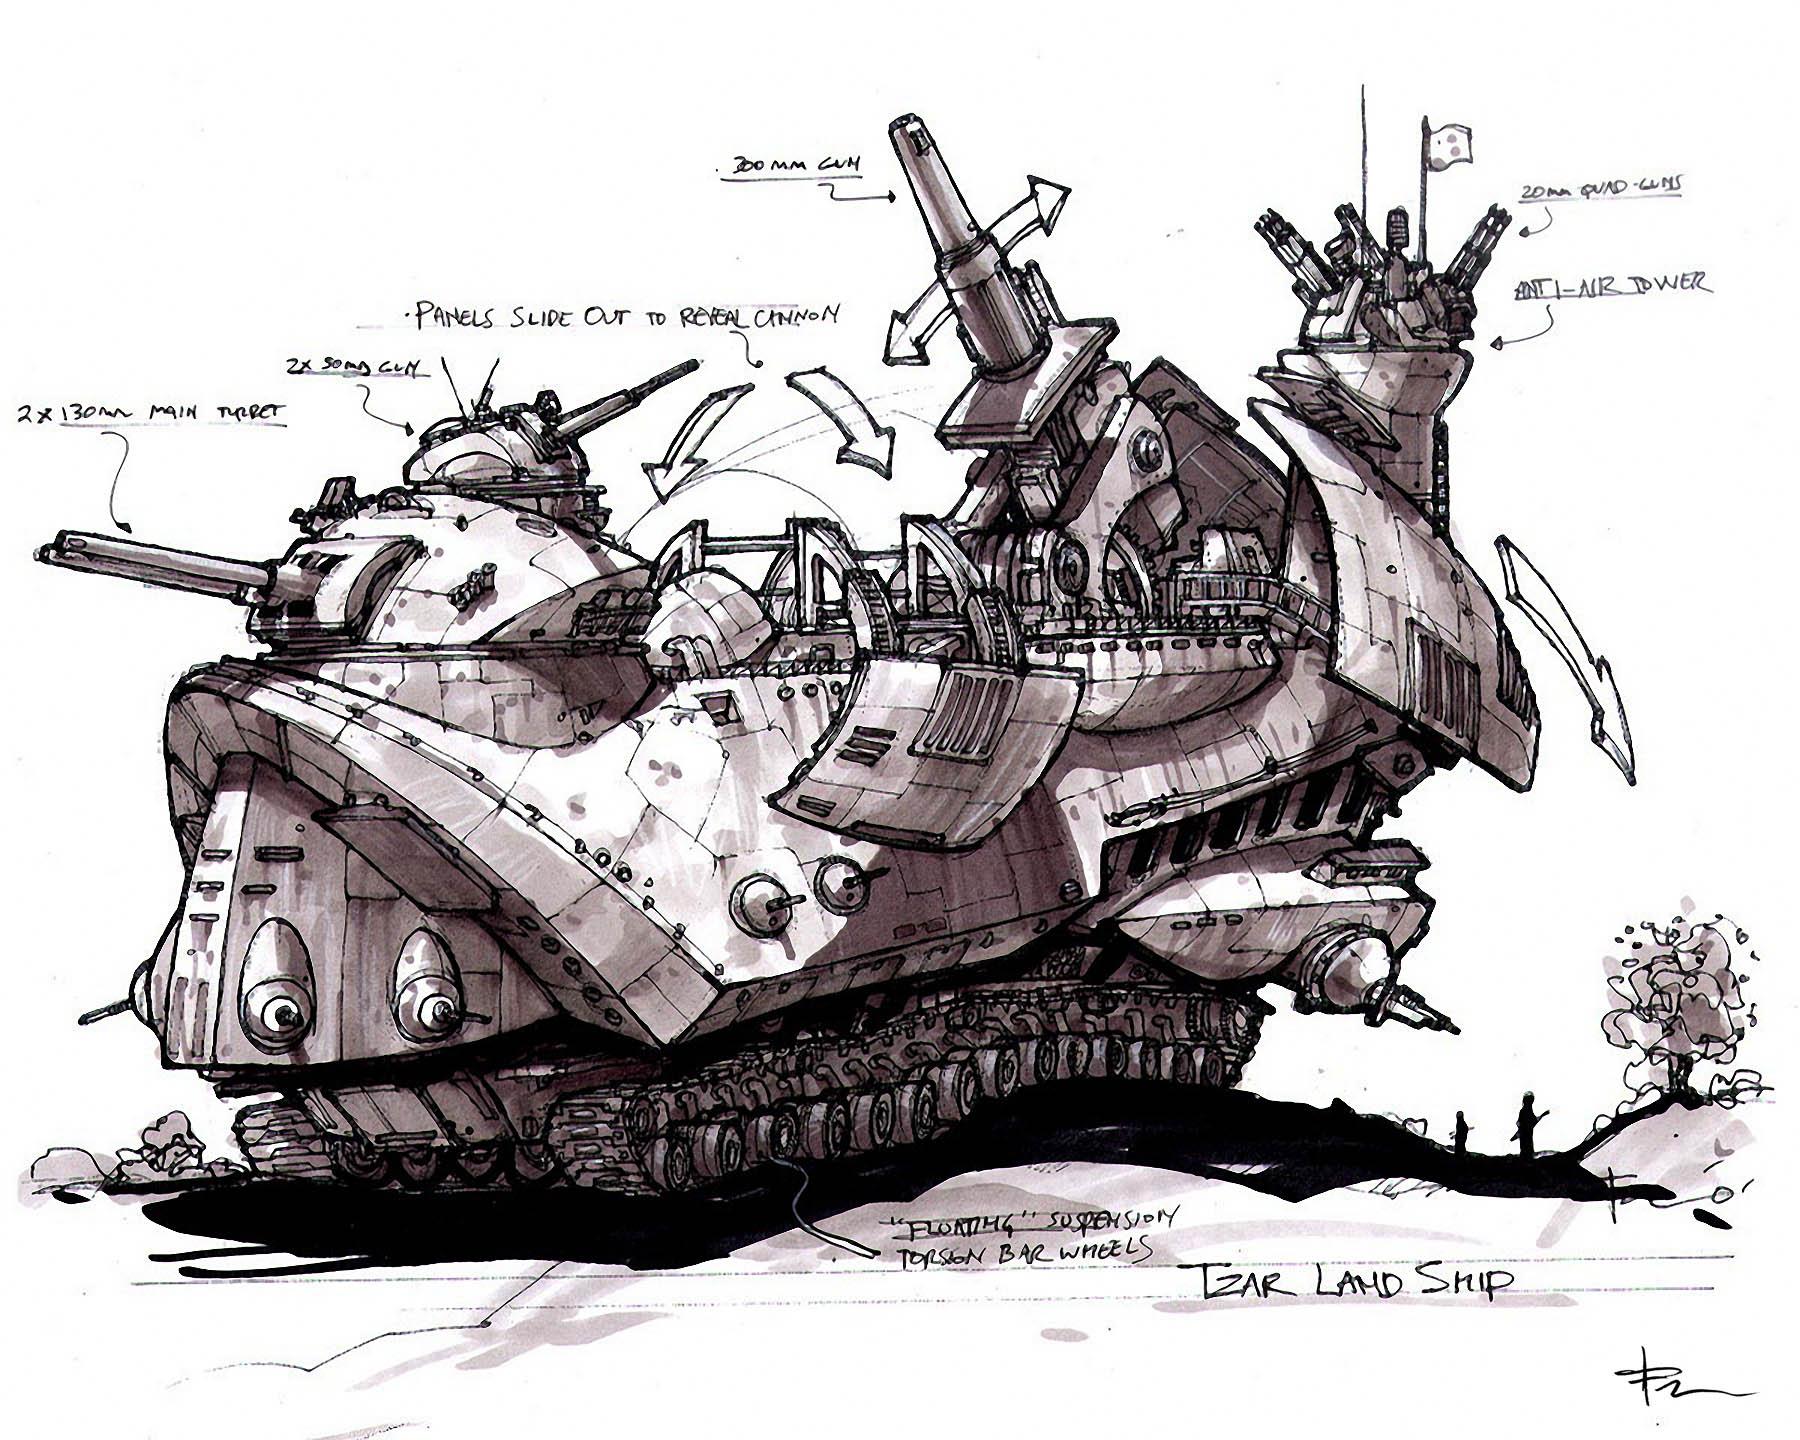 TJFrame-Art_Generals_tzarLandship.jpg